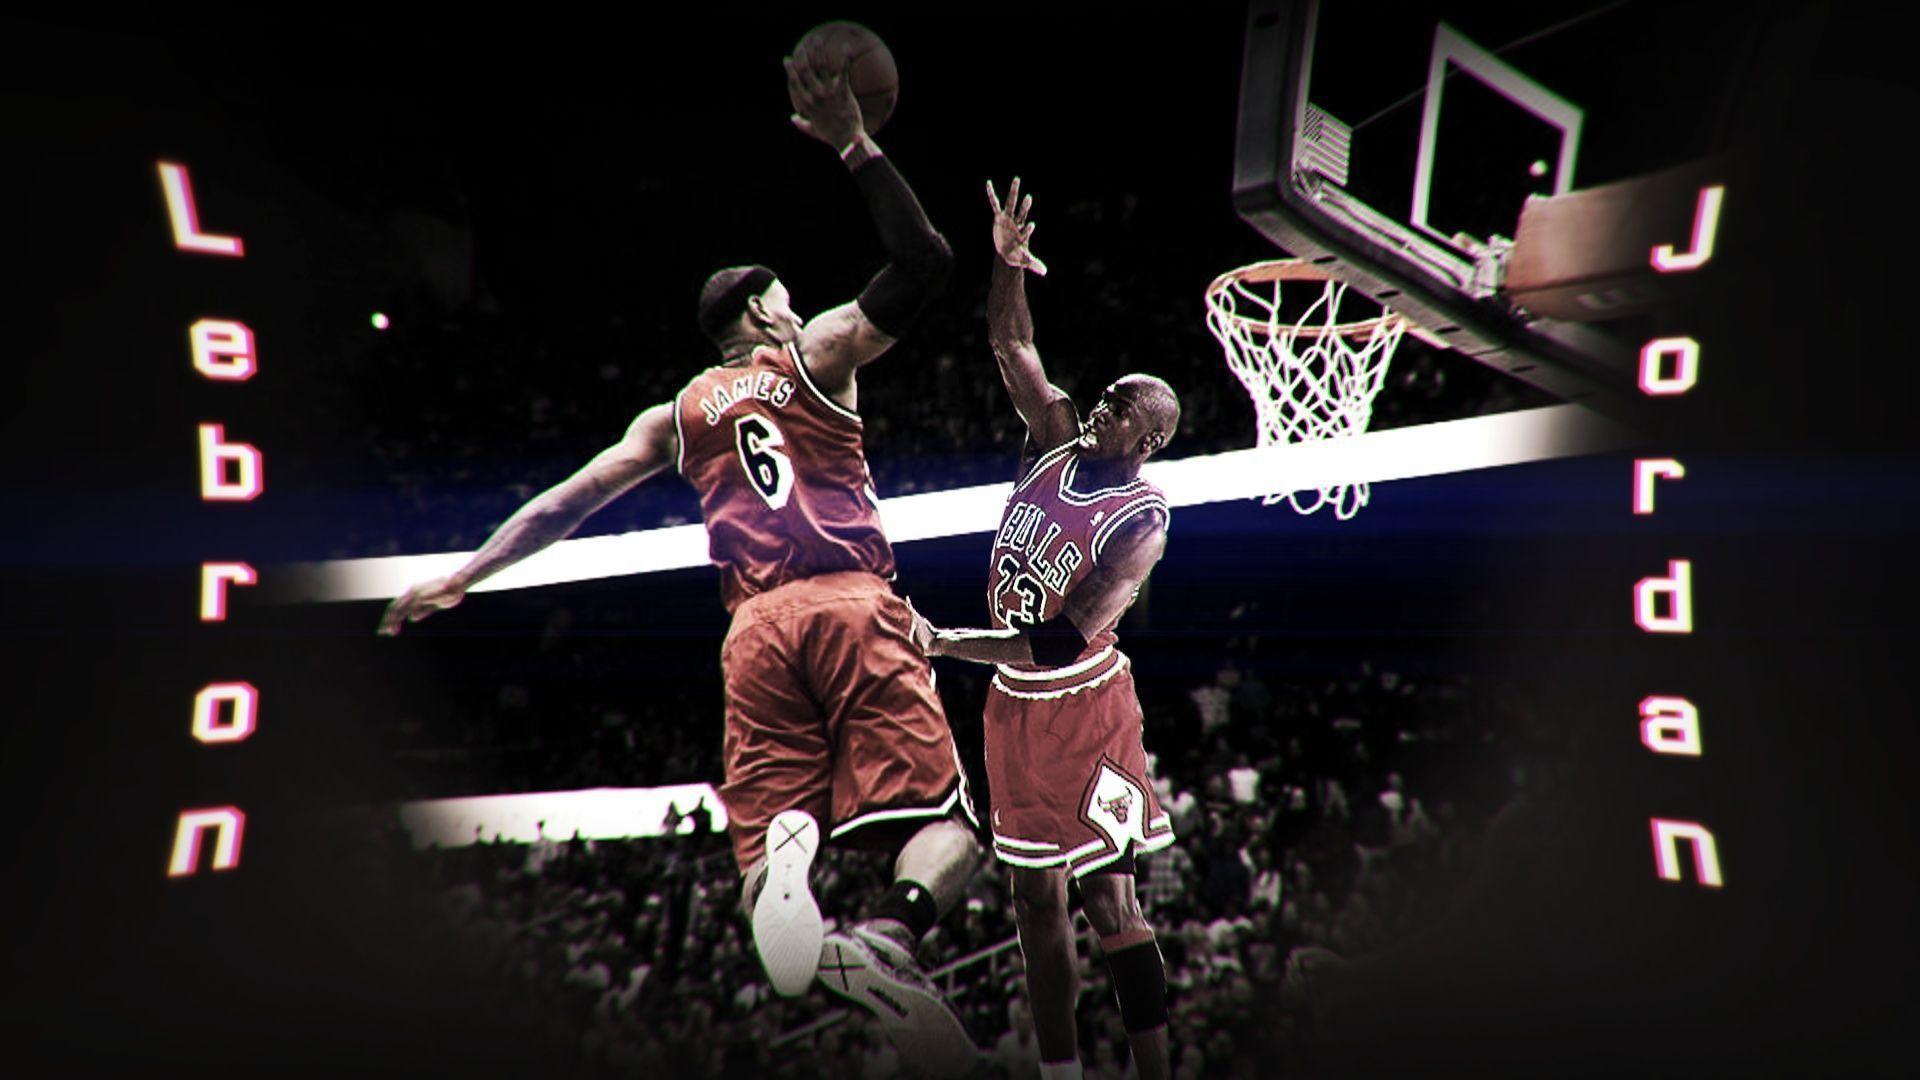 Lebron James Dunking On Michael Jordan By HardWorkRules DeviantArt